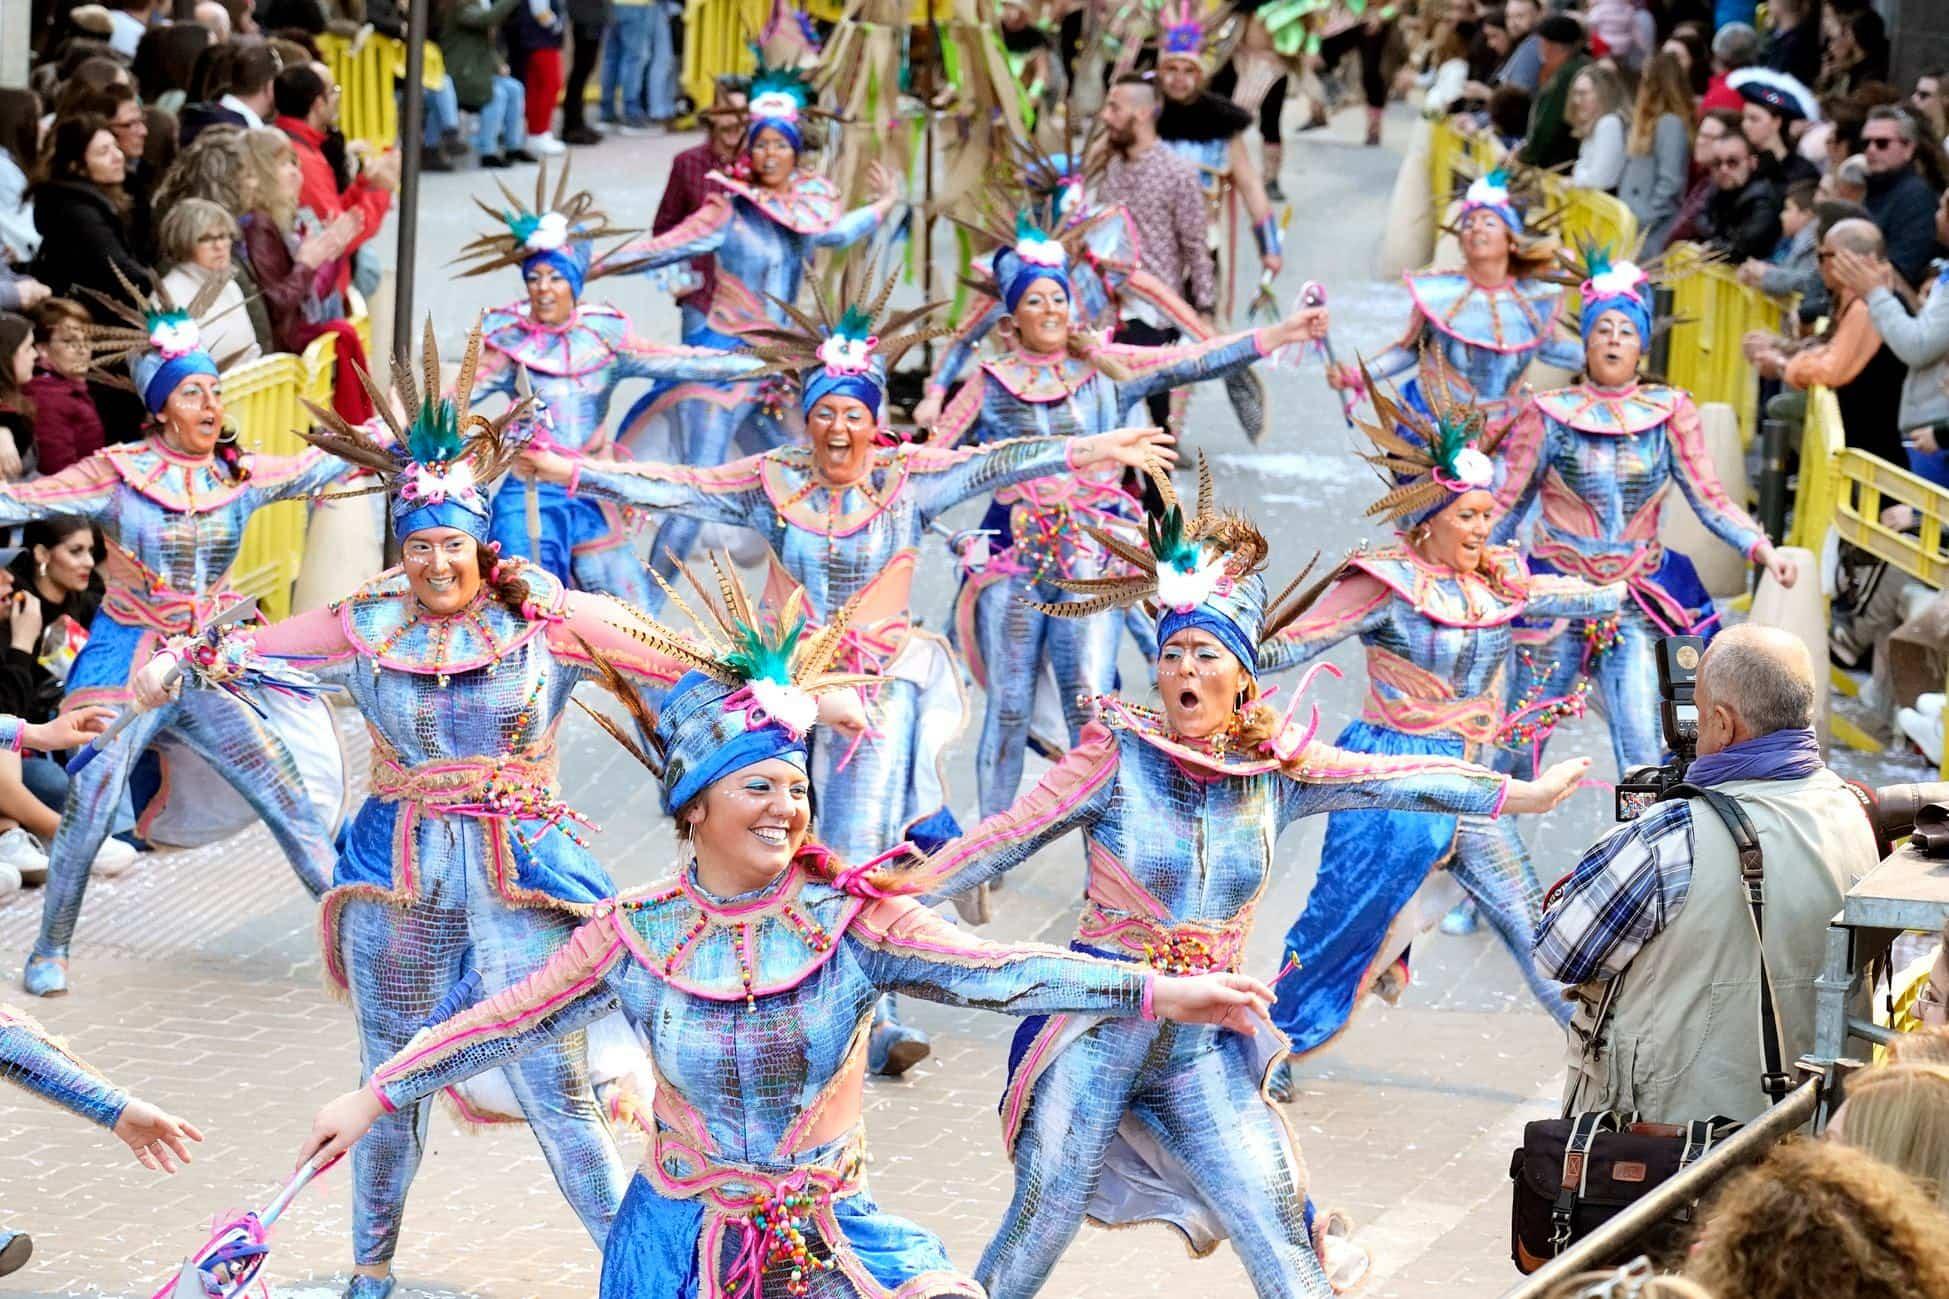 Carnaval de herencia 2020 ofertorio 72 - Selección de fotografías del Ofertorio del Carnaval de Herencia